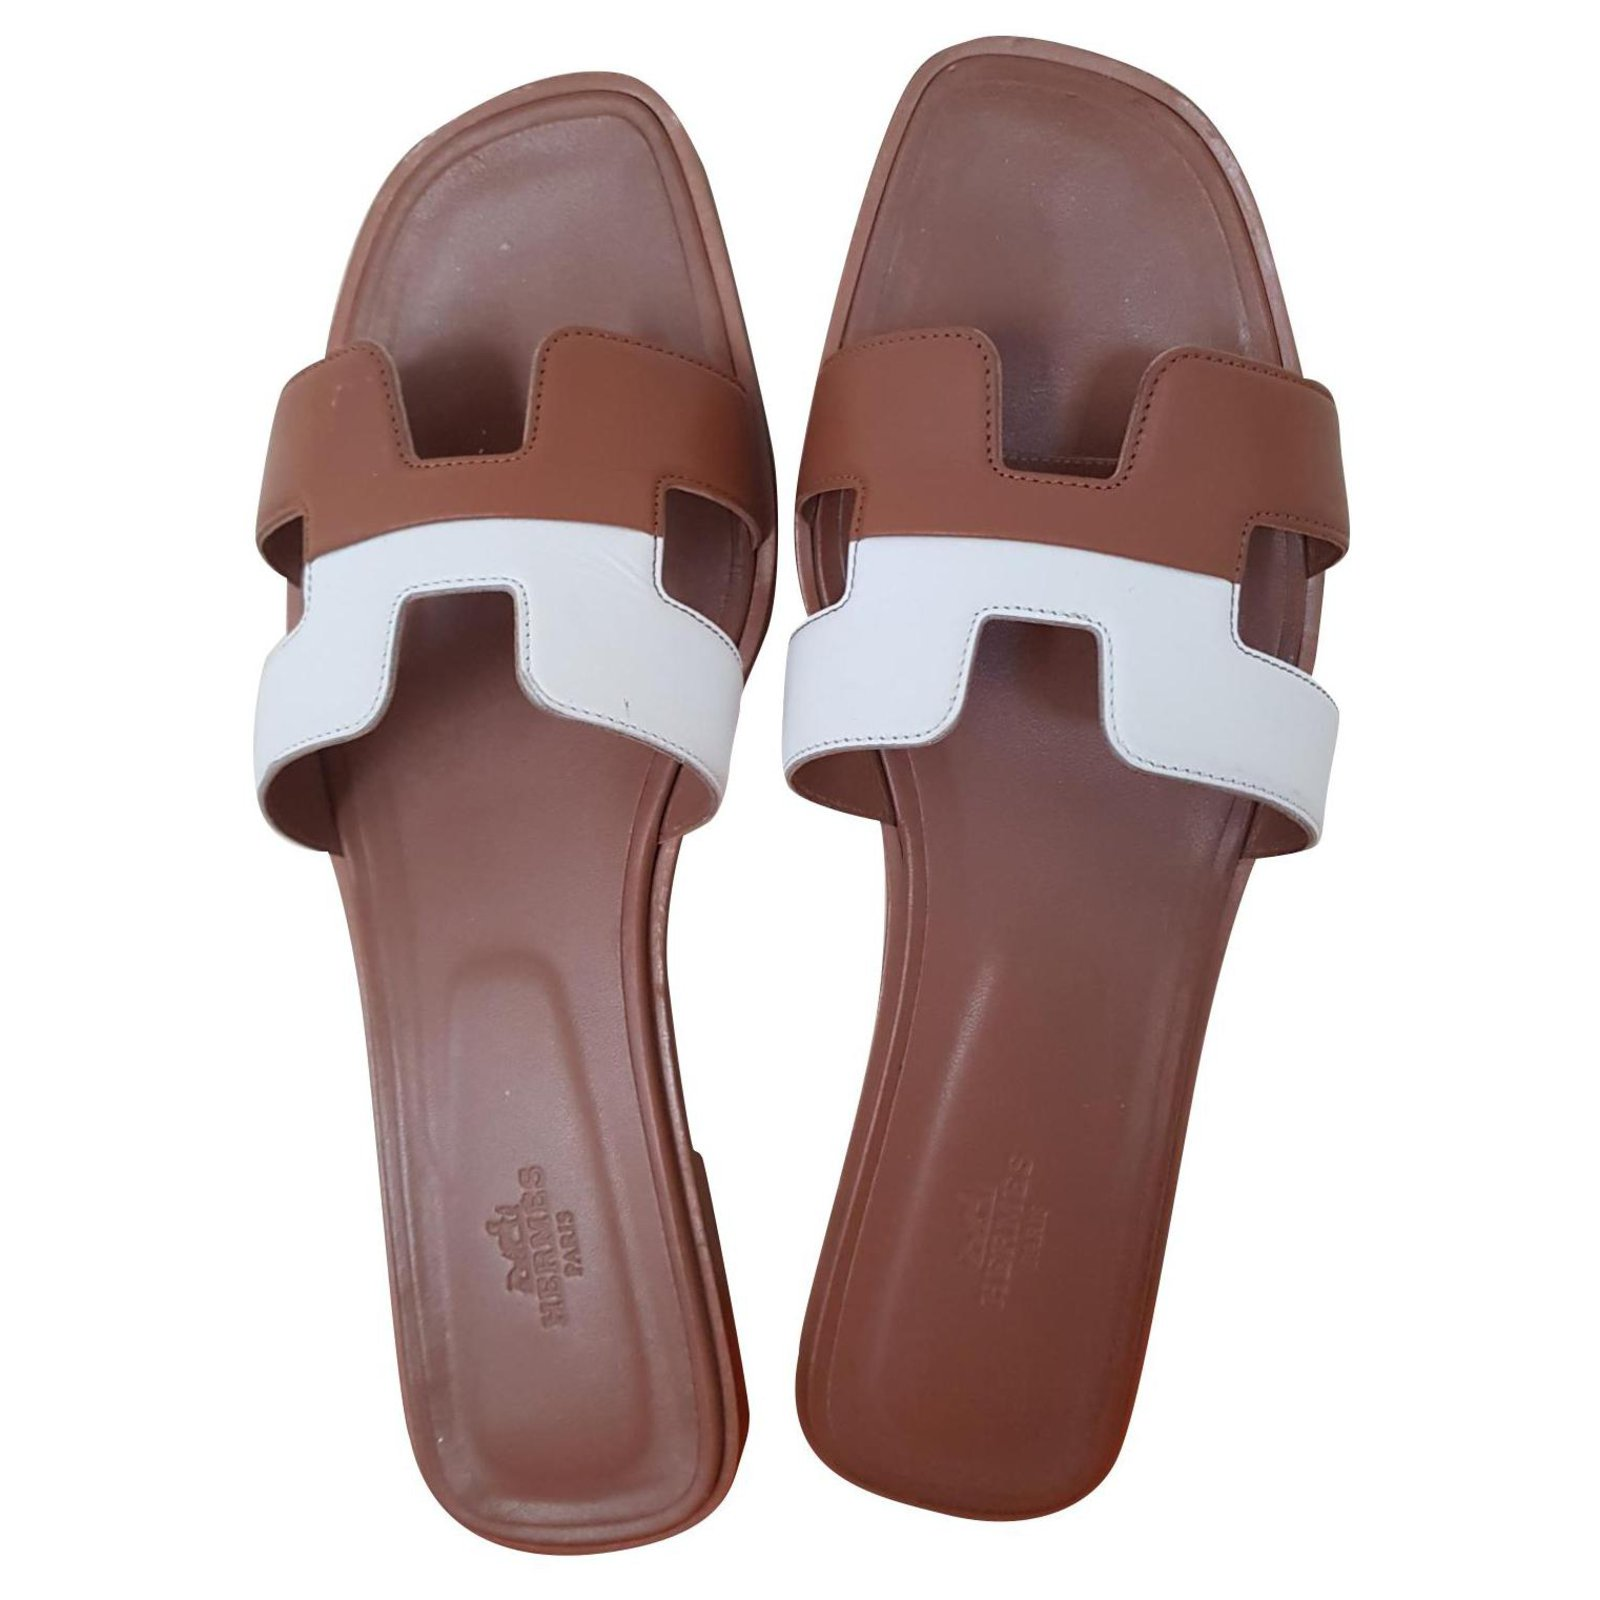 Hermès Oran Hermes Gold / White Sandals